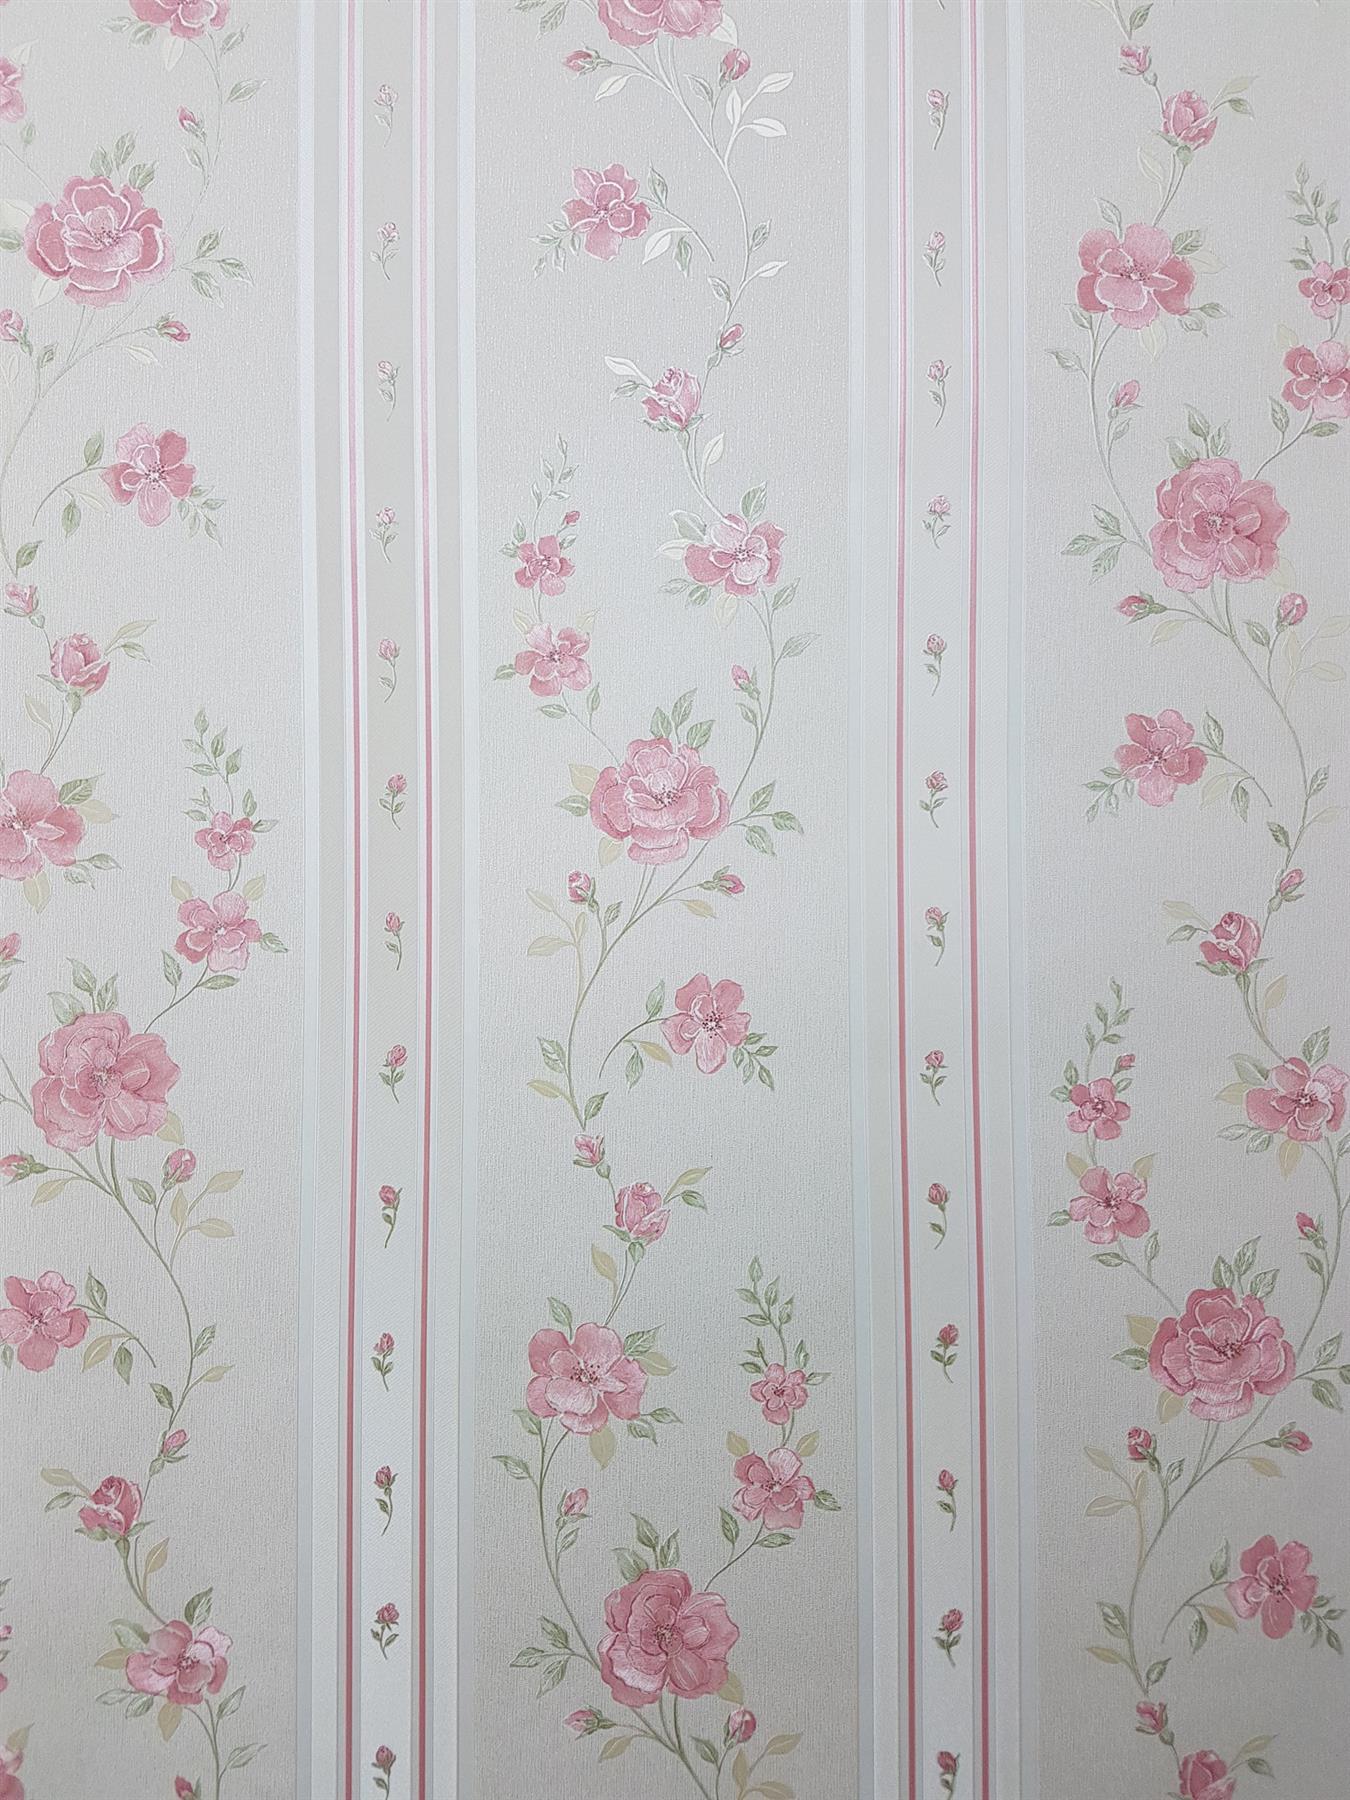 Pink Cream Floral Stripe Wallpaper Green Embossed Pre Pasted Vinyl